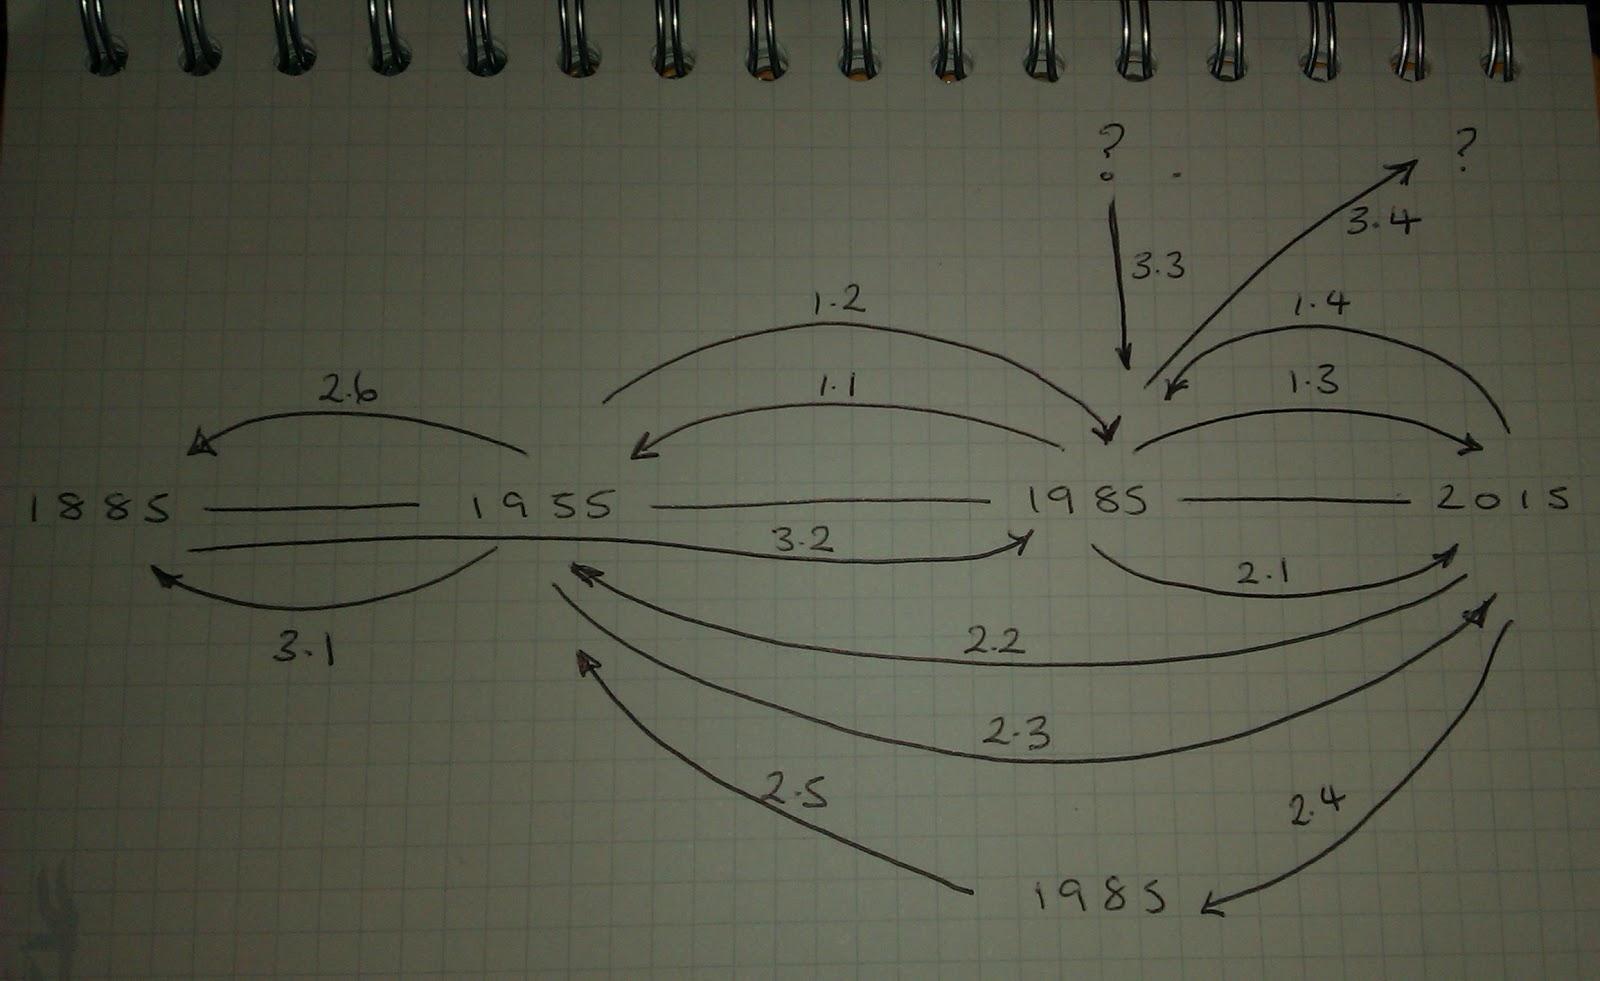 http://4.bp.blogspot.com/-6Jl_9PP9fJM/UM-flE1xckI/AAAAAAAAJBU/DsSFyoewQso/s1600/Back+To+The+Future+Timeline.jpg